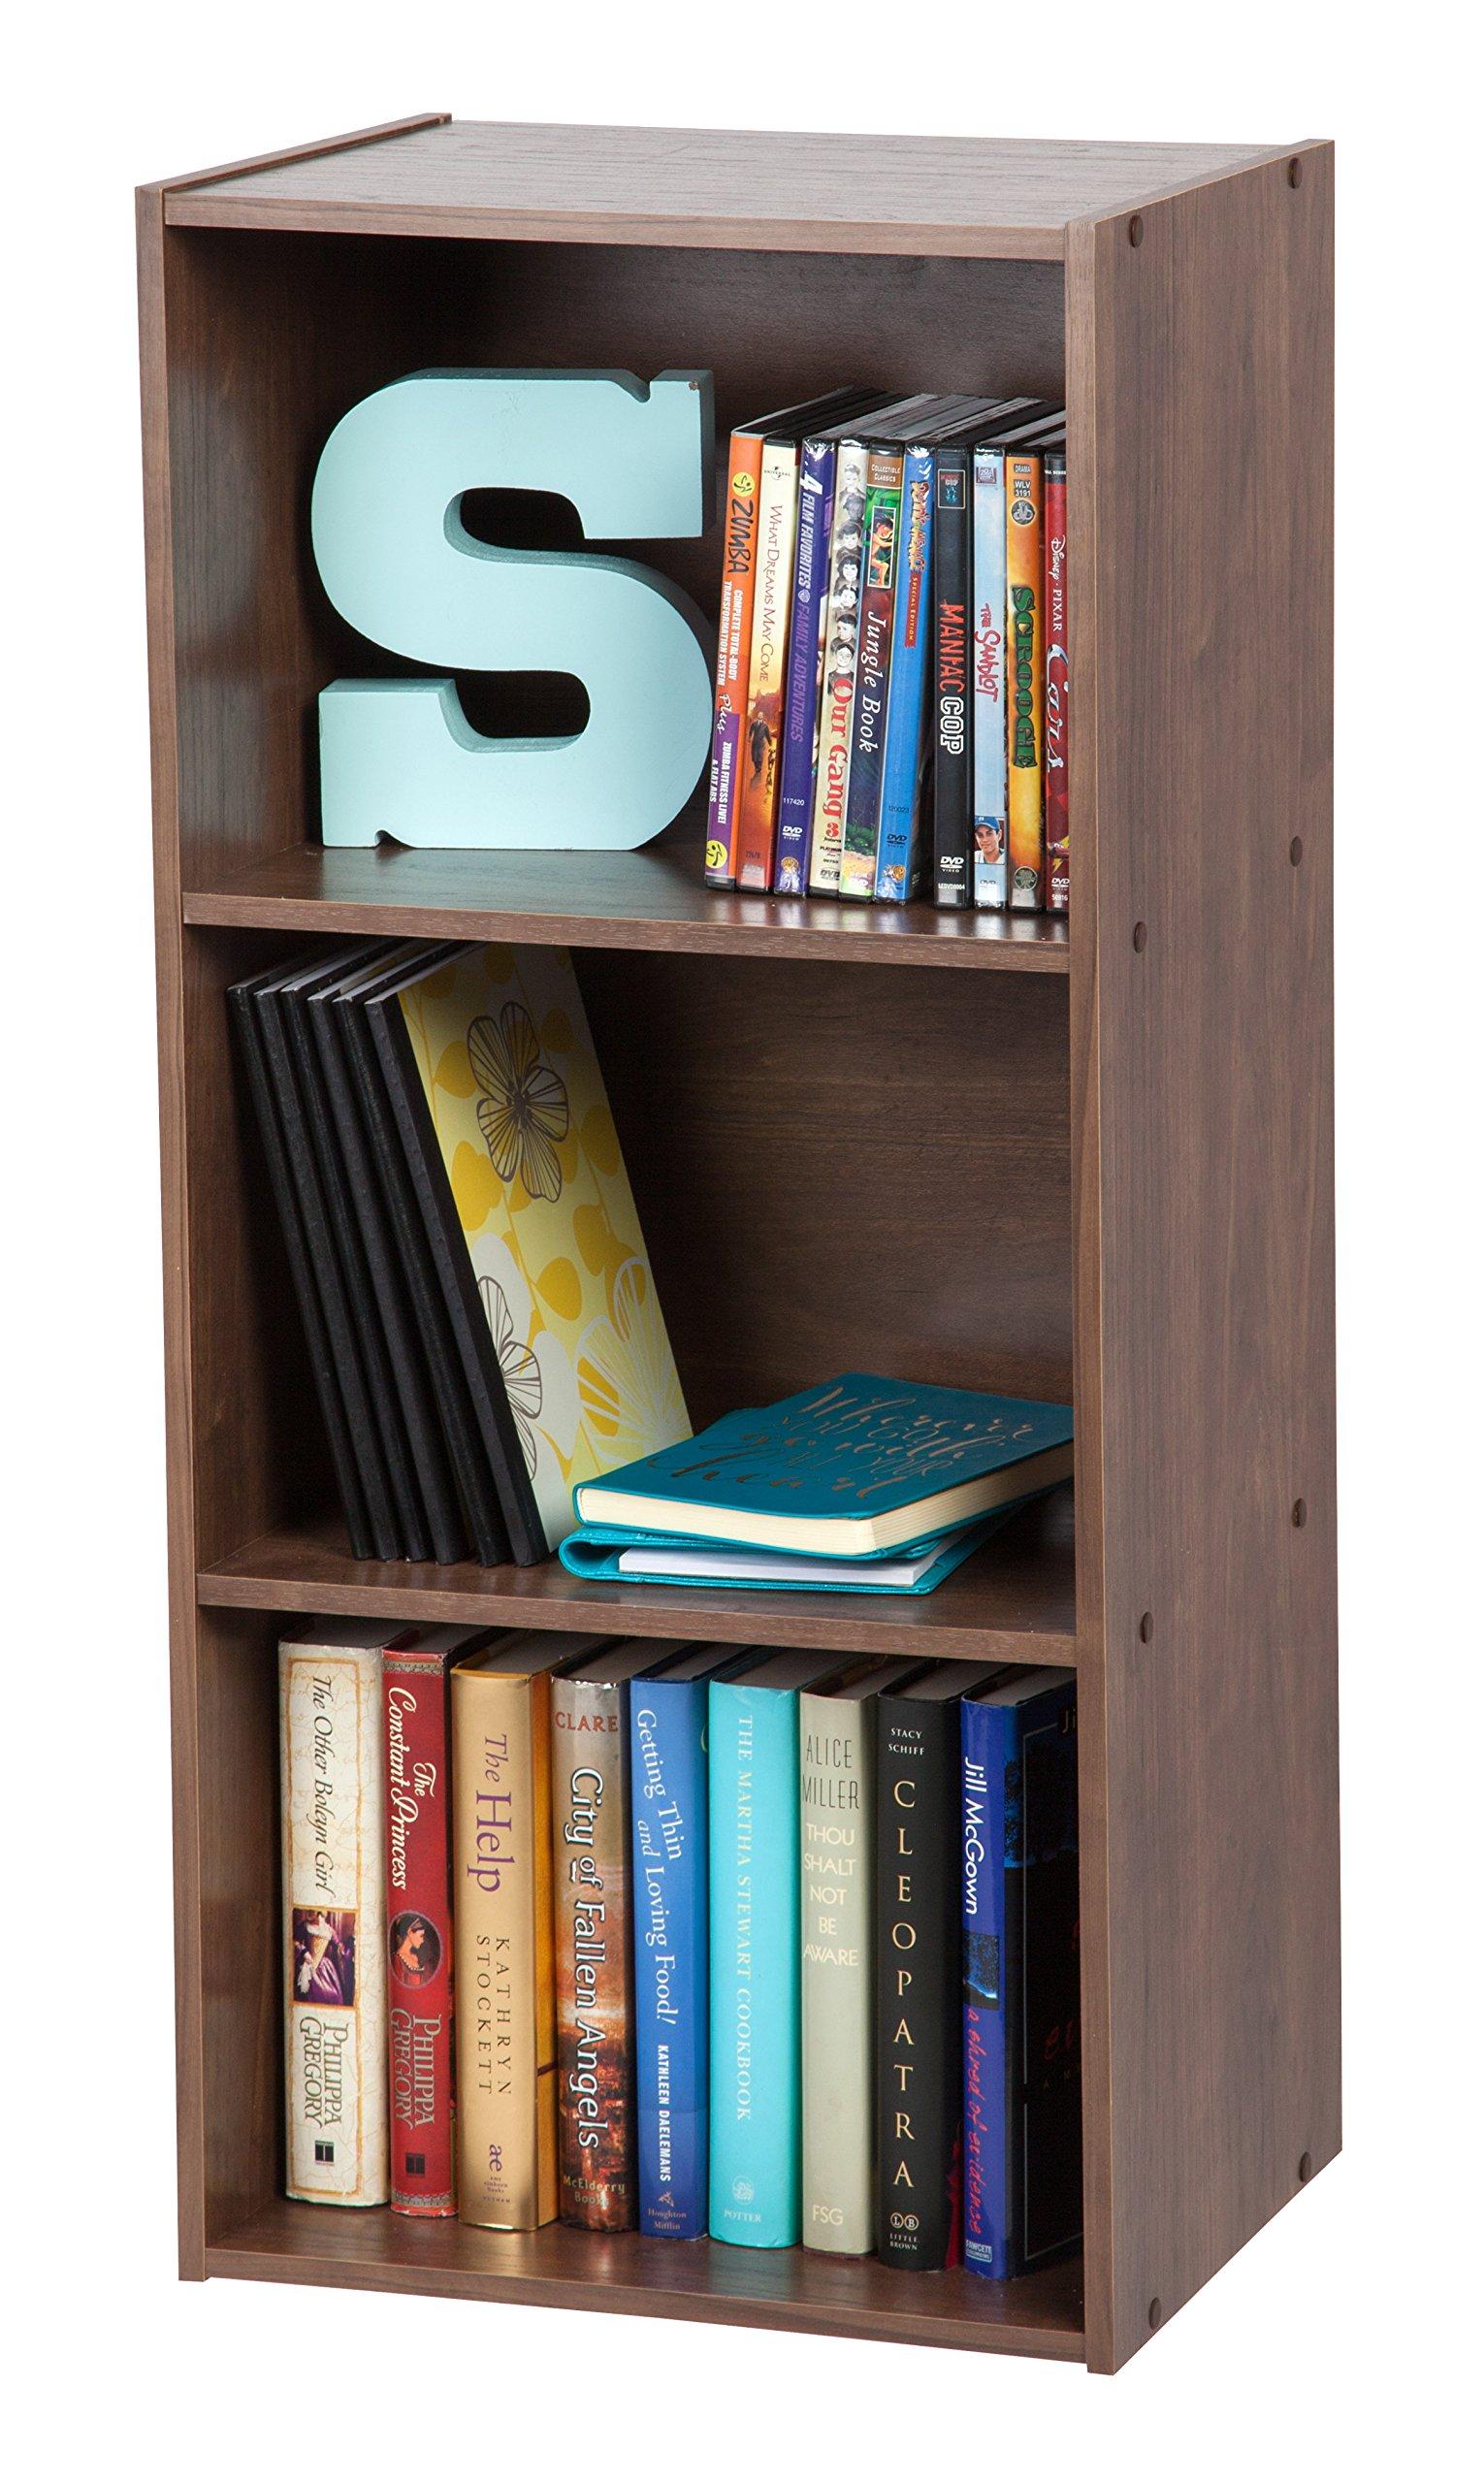 IRIS 3-Tier Basic Wood Bookcase Storage Shelf, Dark Brown by IRIS USA, Inc. (Image #3)